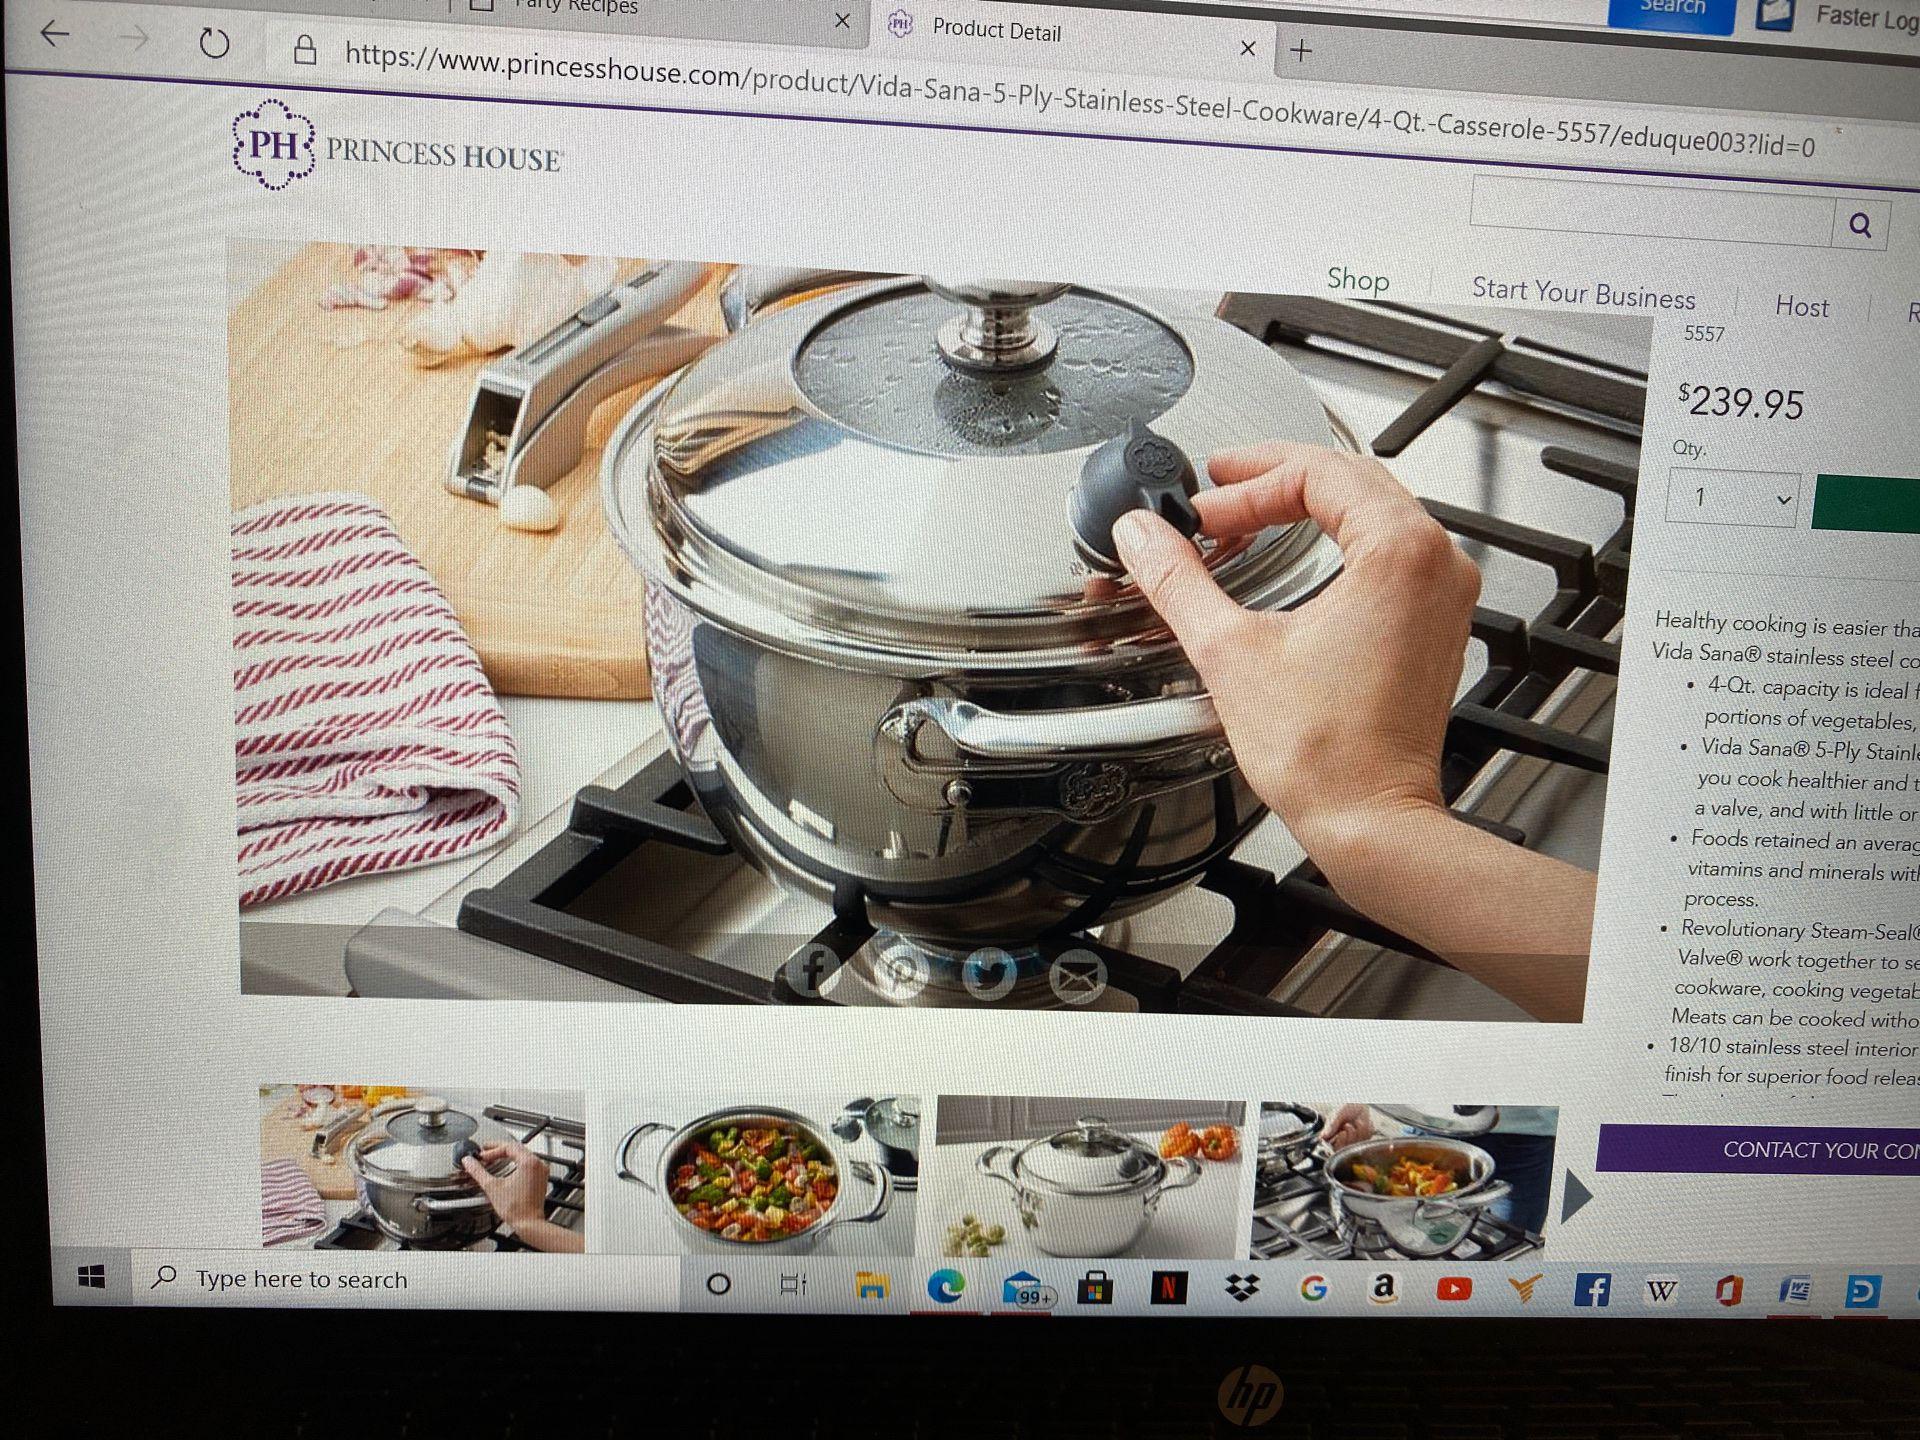 Princess House 5-play stainless Steel Cookware 4-QT casserole